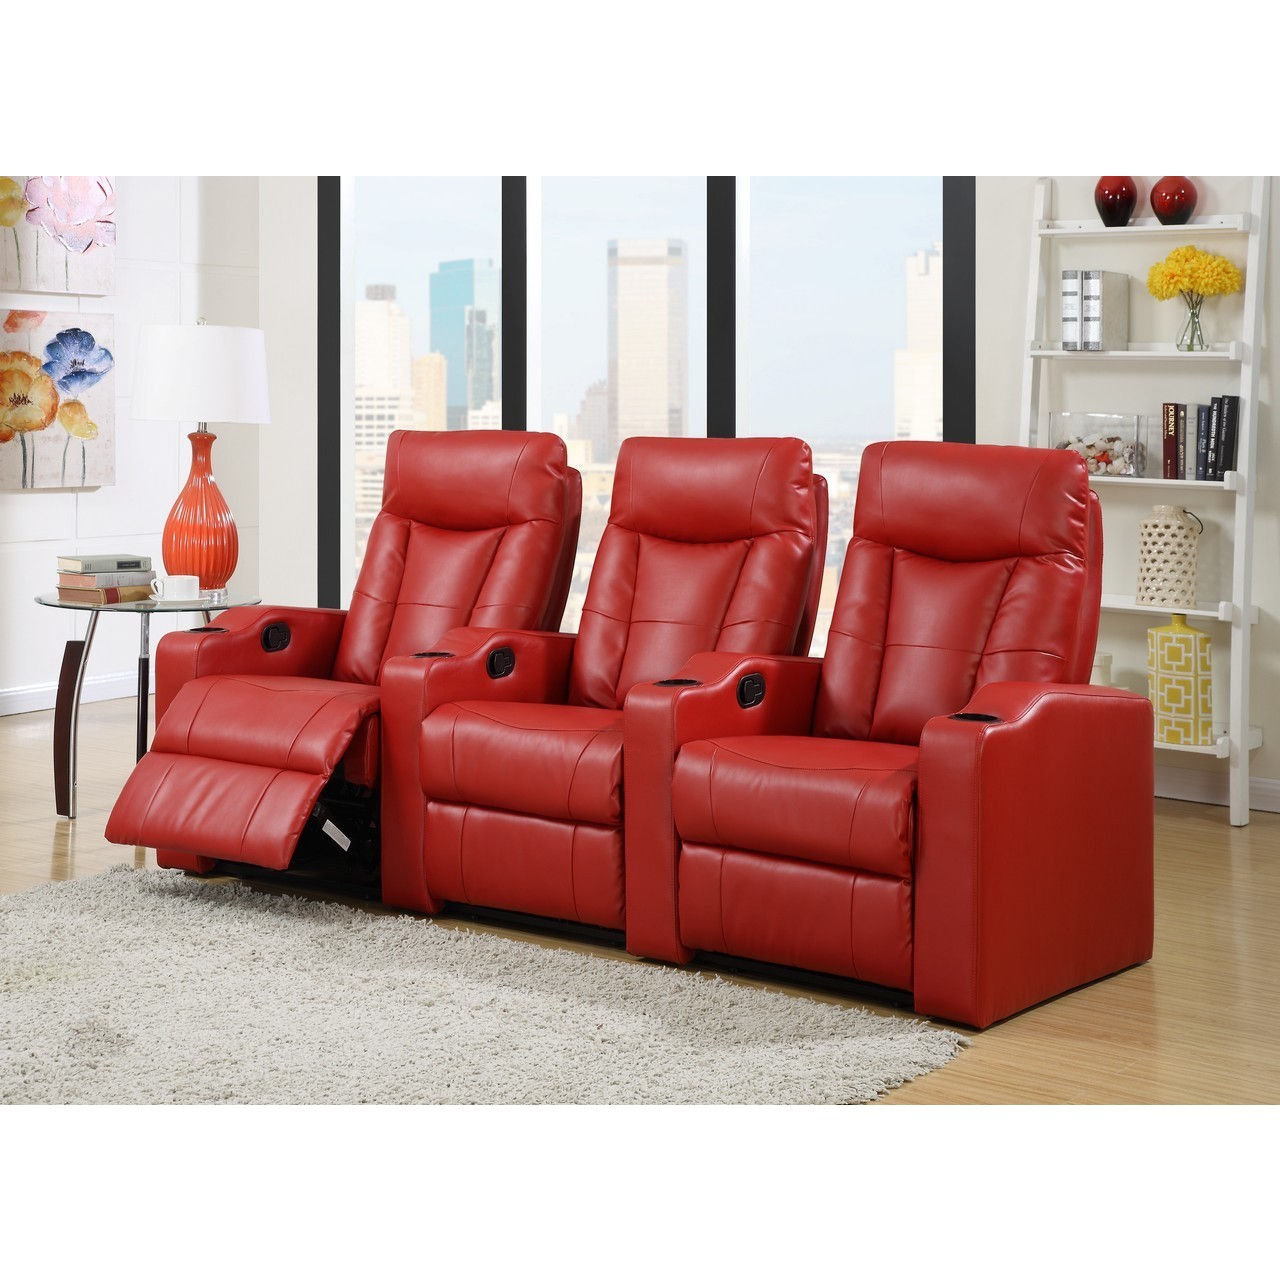 Premium Home Theater Recliner Chair Discount Decor Cheap Mattresses Affo